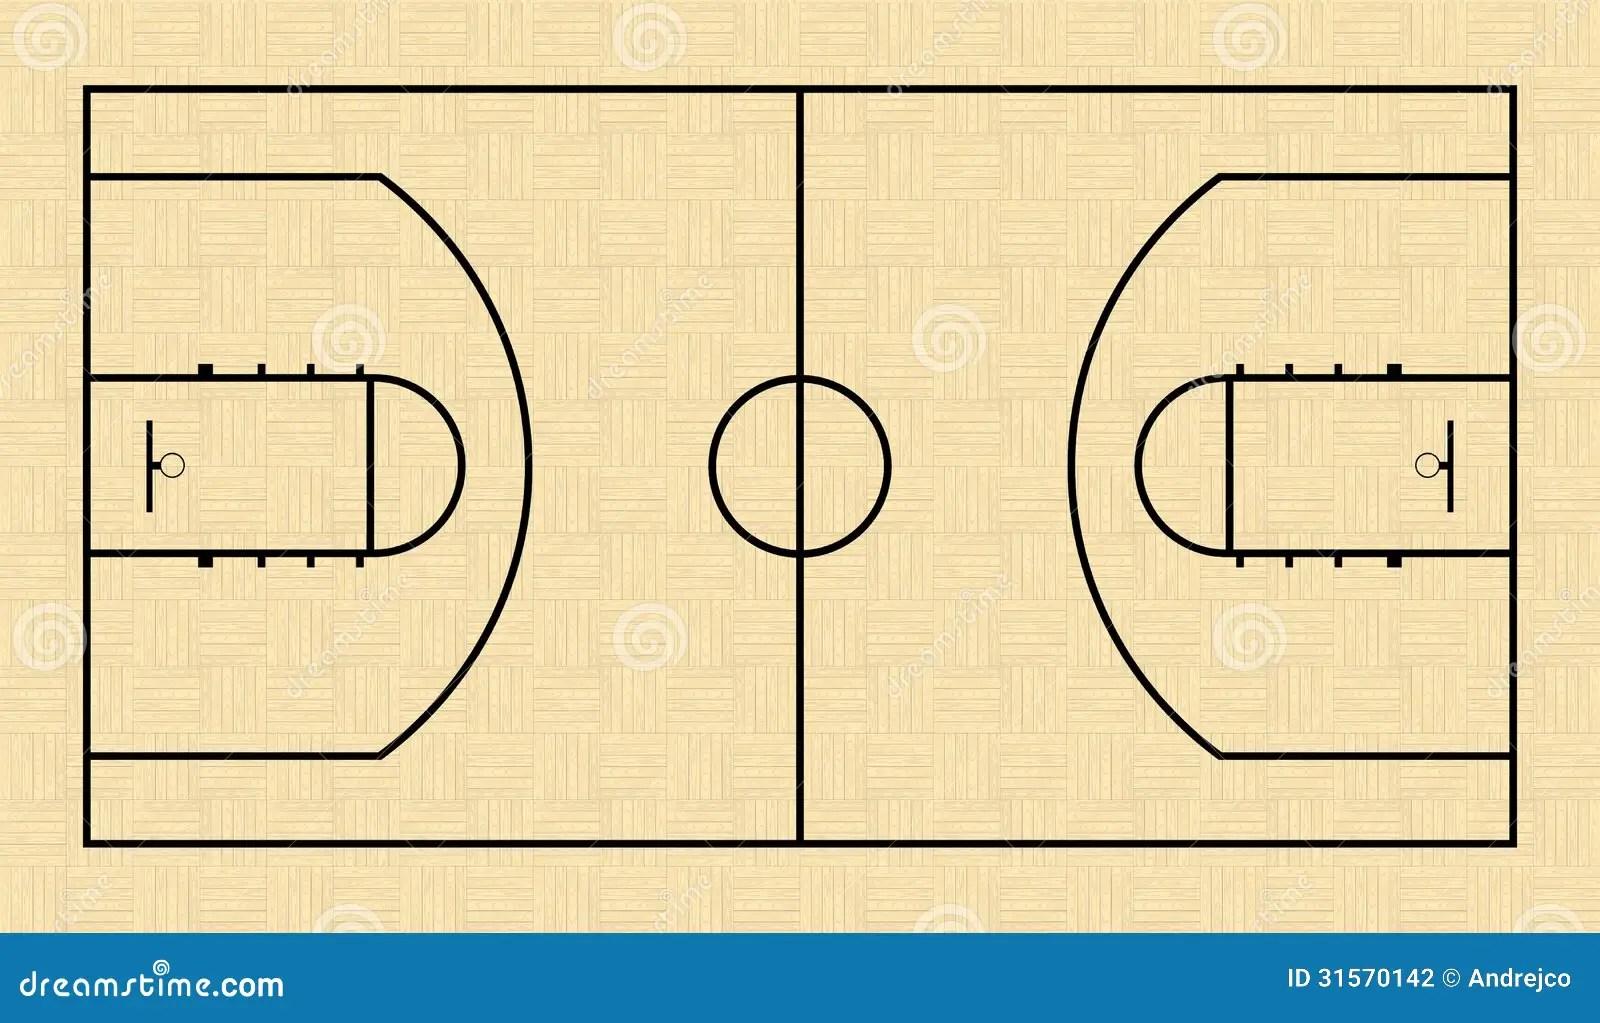 high school basketball court diagram 1999 toyota corolla wiring radio quart scores